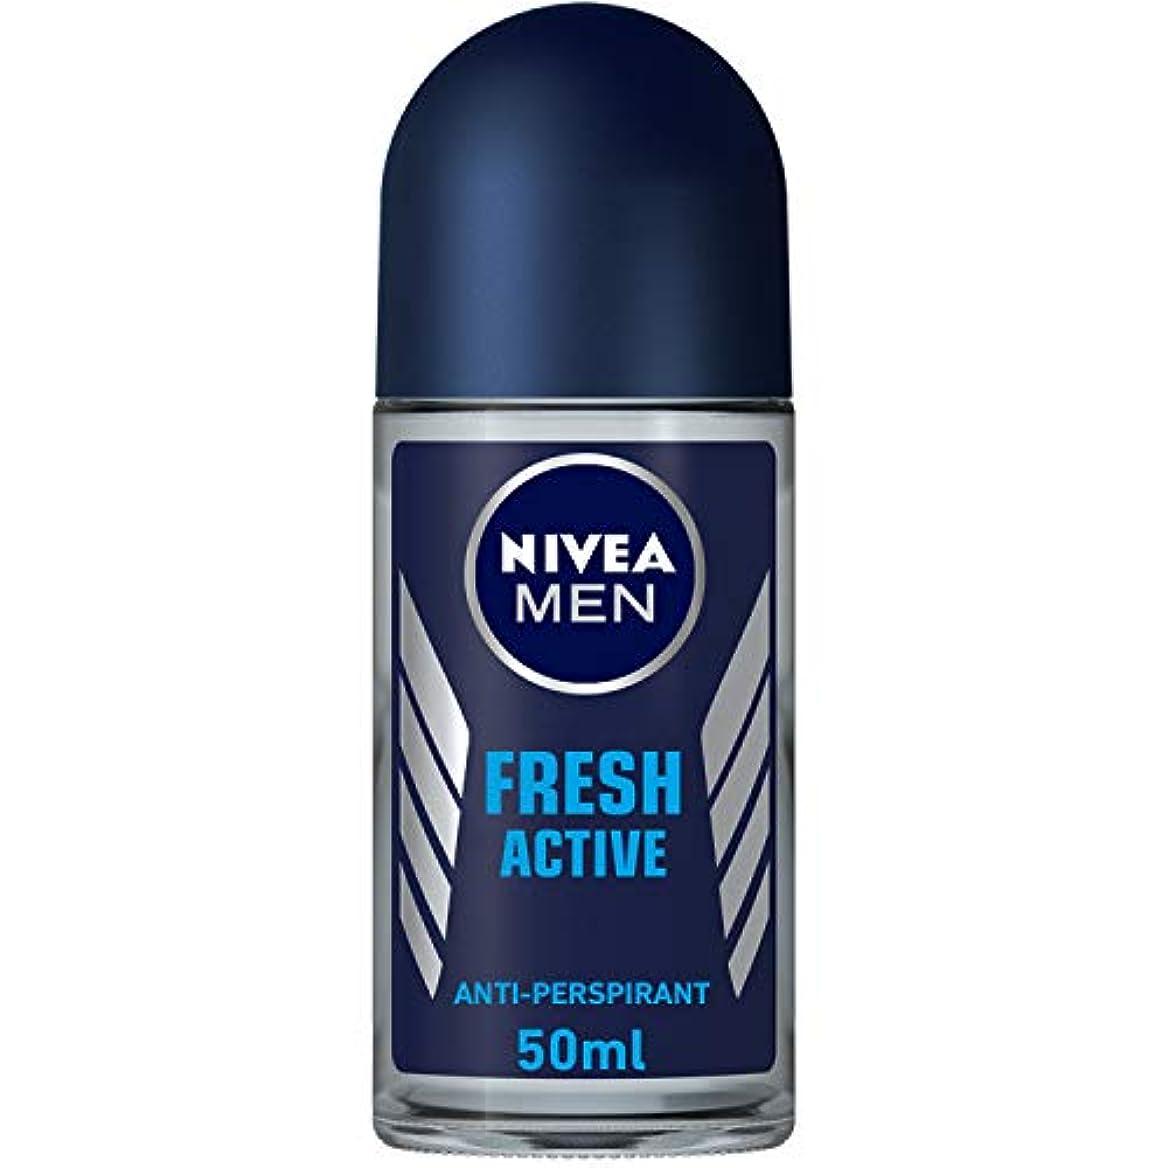 NIVEA Men Brazil ブラジル製 ニベア メン ロールオンデオドラント フレッシュアクティブ Fresh Active 50ml